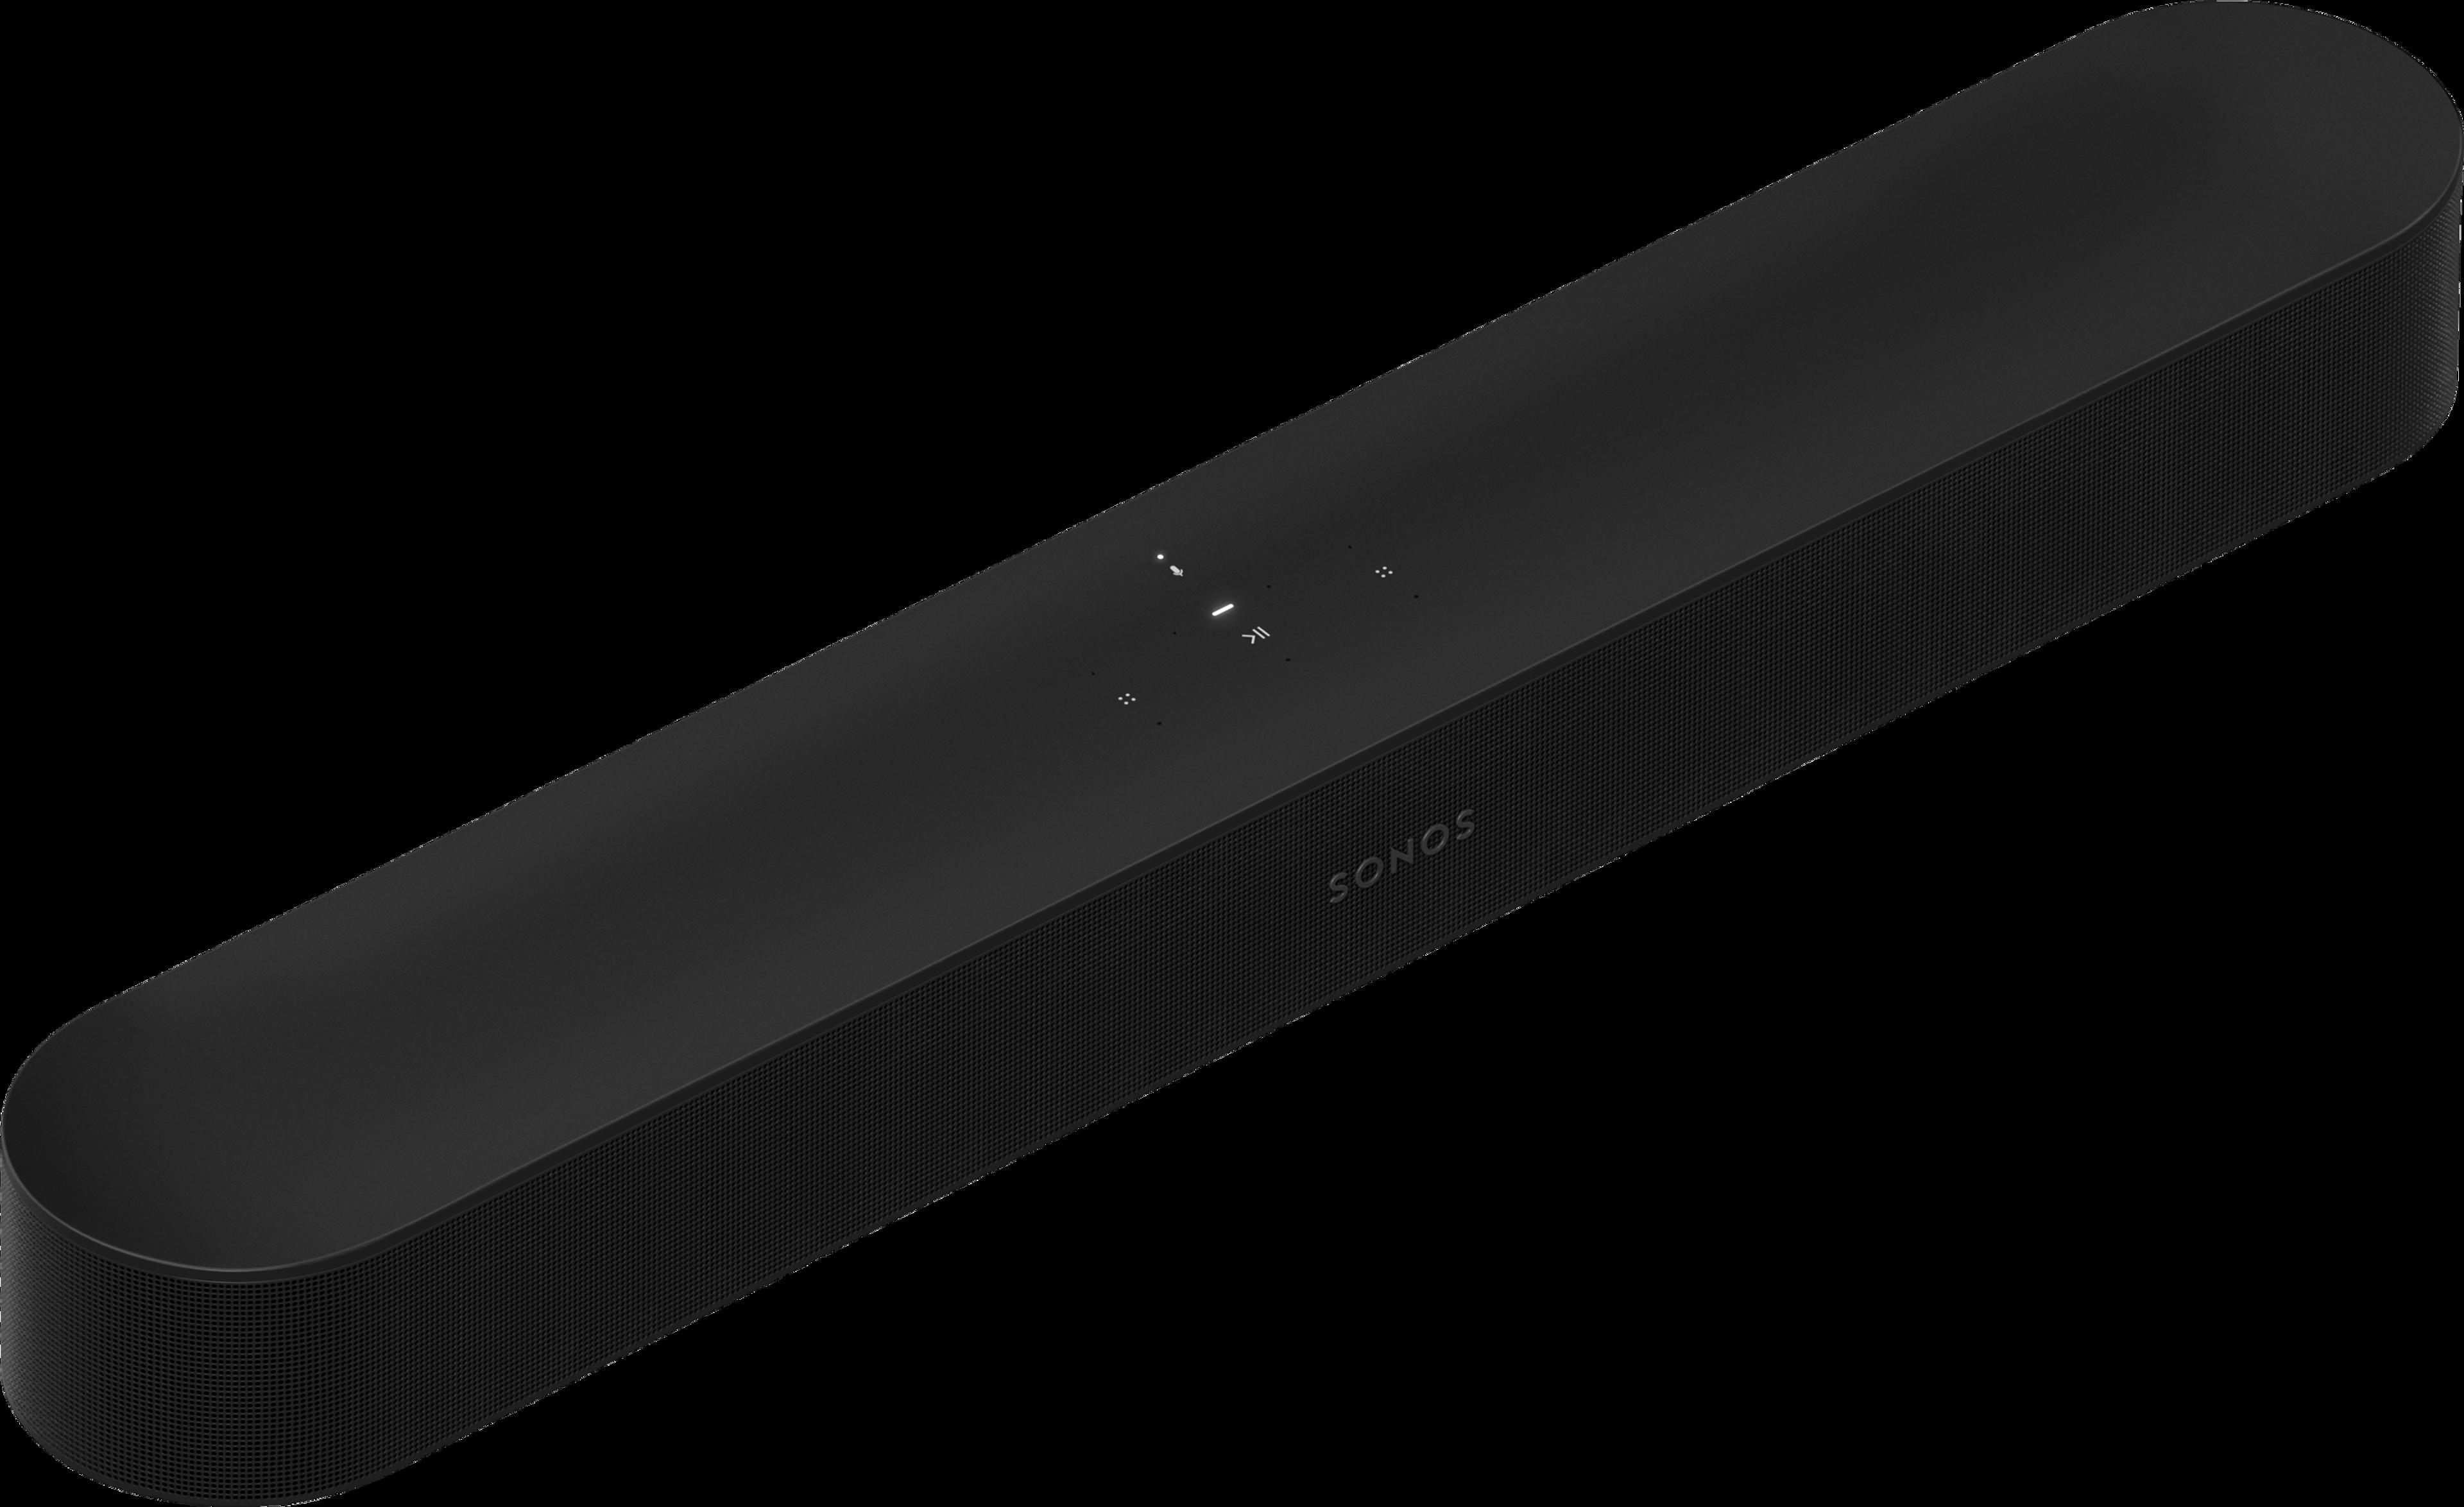 Sonos Beam noire - profil